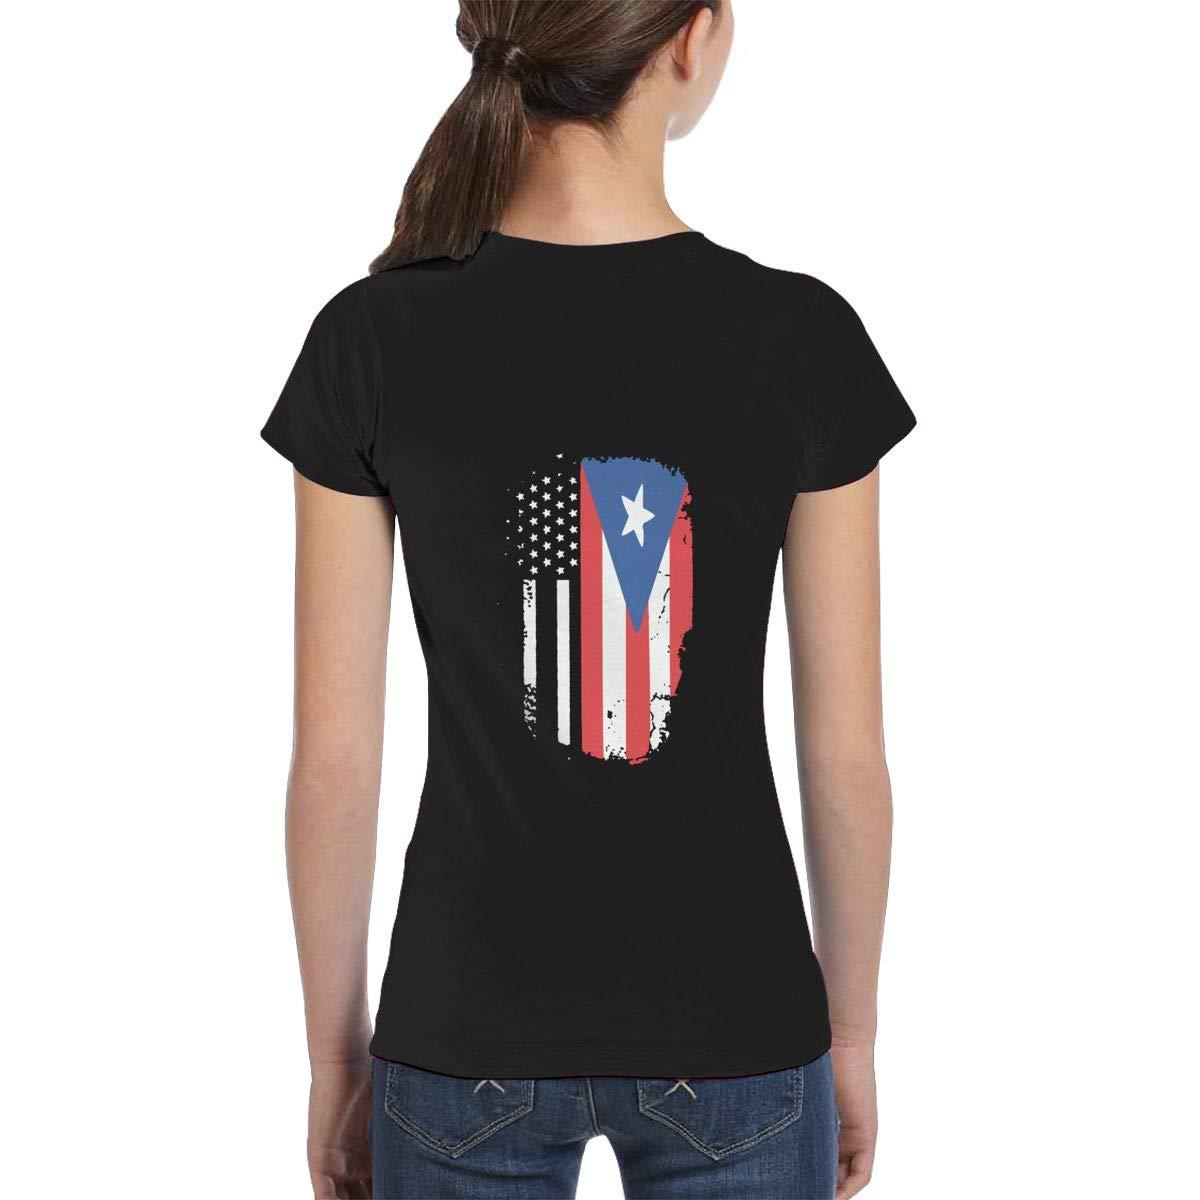 Casual Tunic Shirt Dress XS-XL Girls Short Sleeve American Puerto Rico Flag Shirts